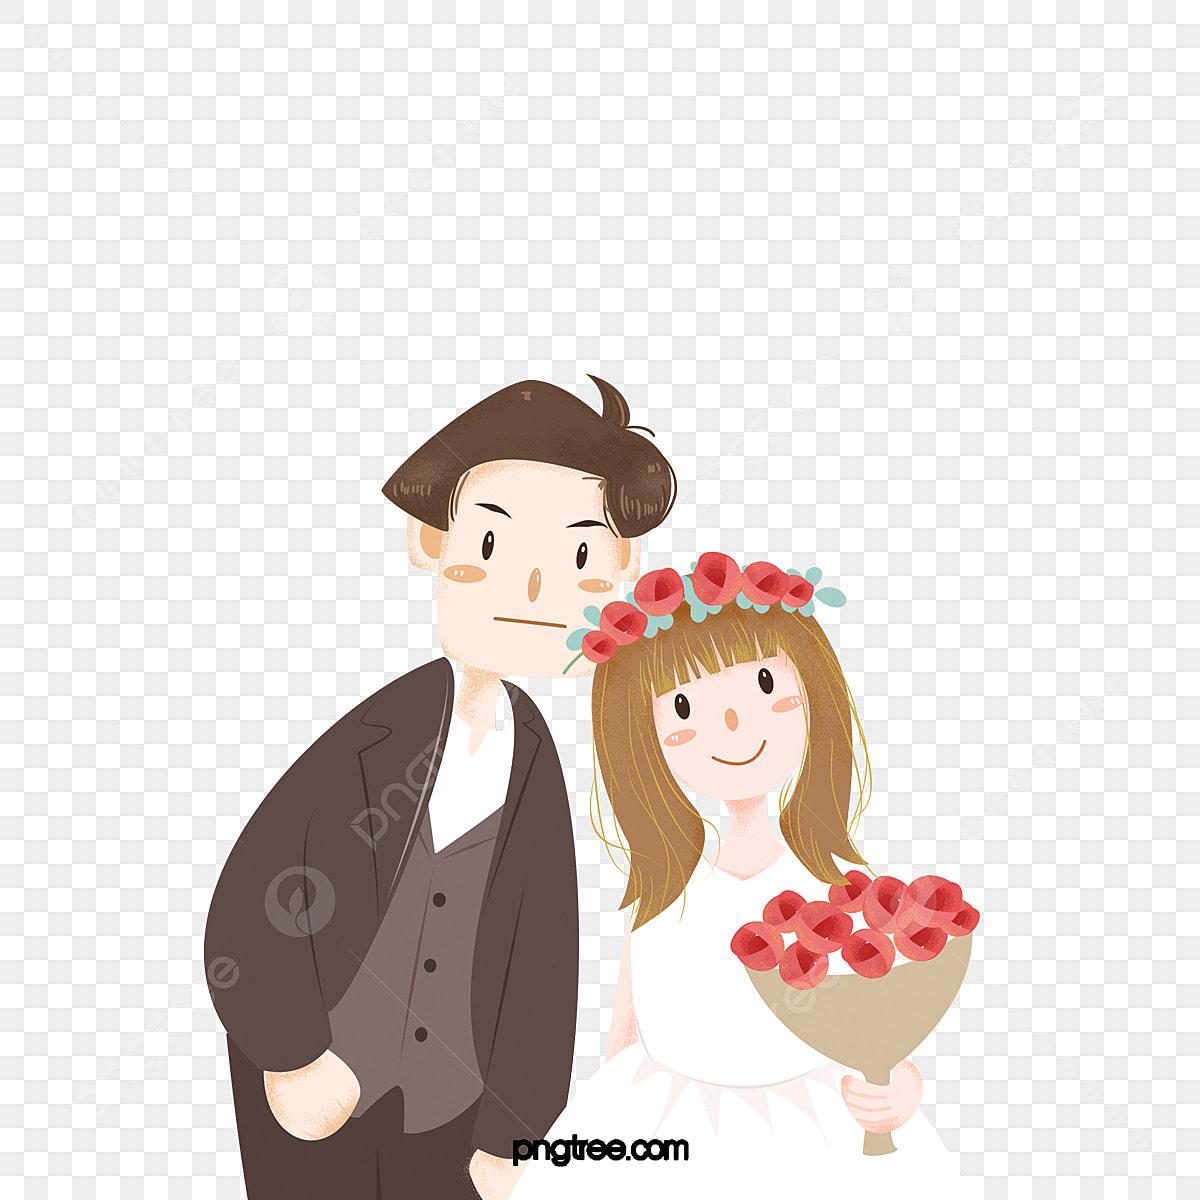 Pasangan Menembak Gambar Perkahwinan Suka Pasangan